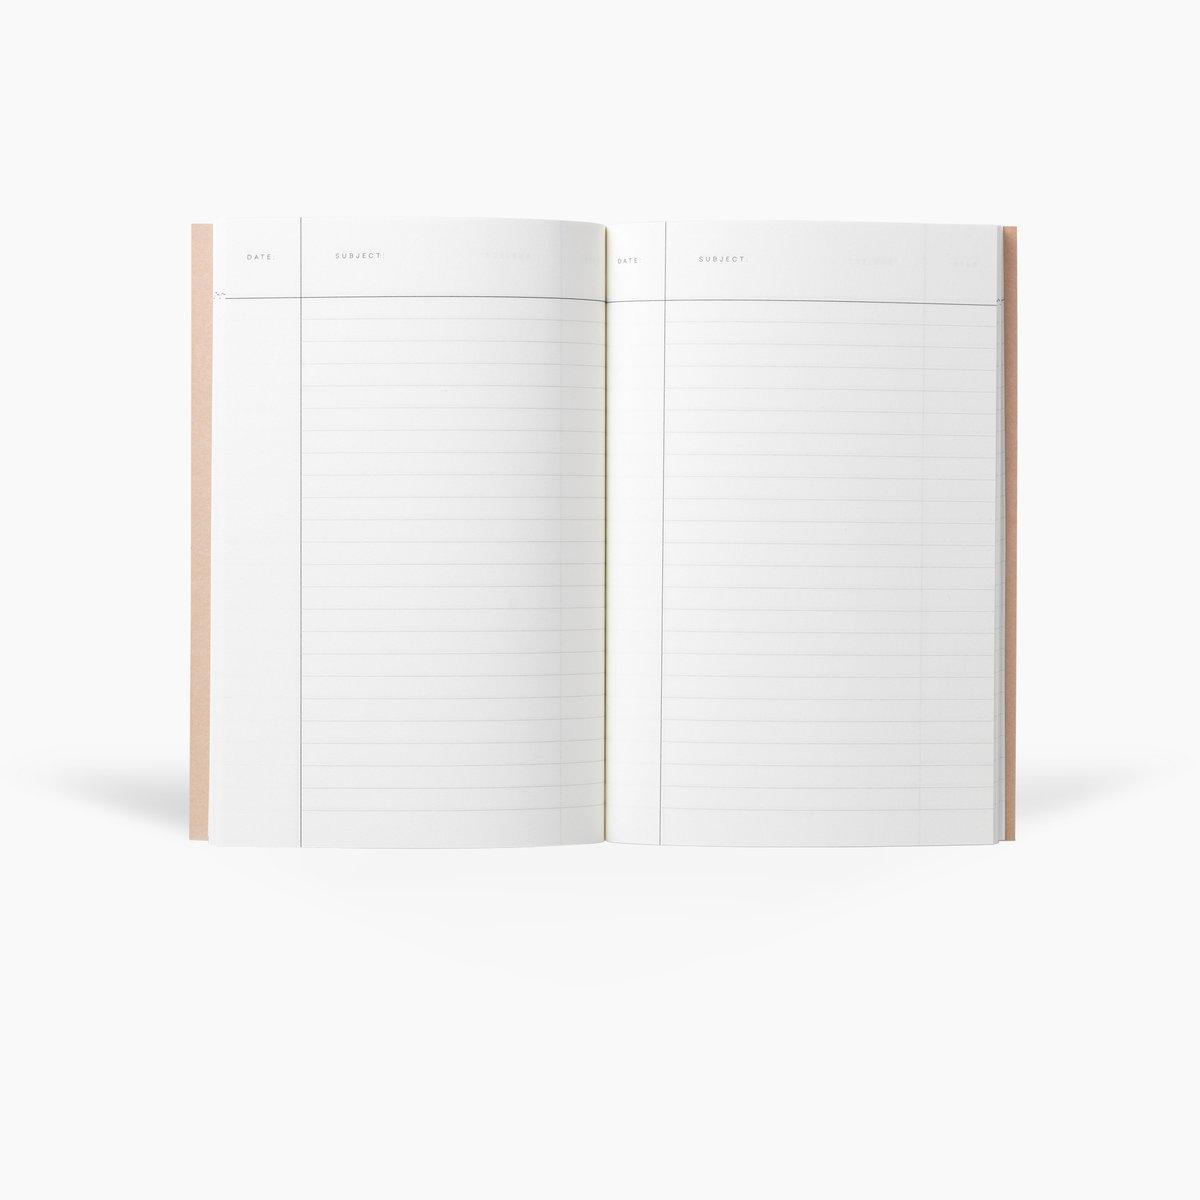 NOTEM NOTIZBUCH NOTEBOOK VITA SMALL DARK GREEN ONLINE SHOP